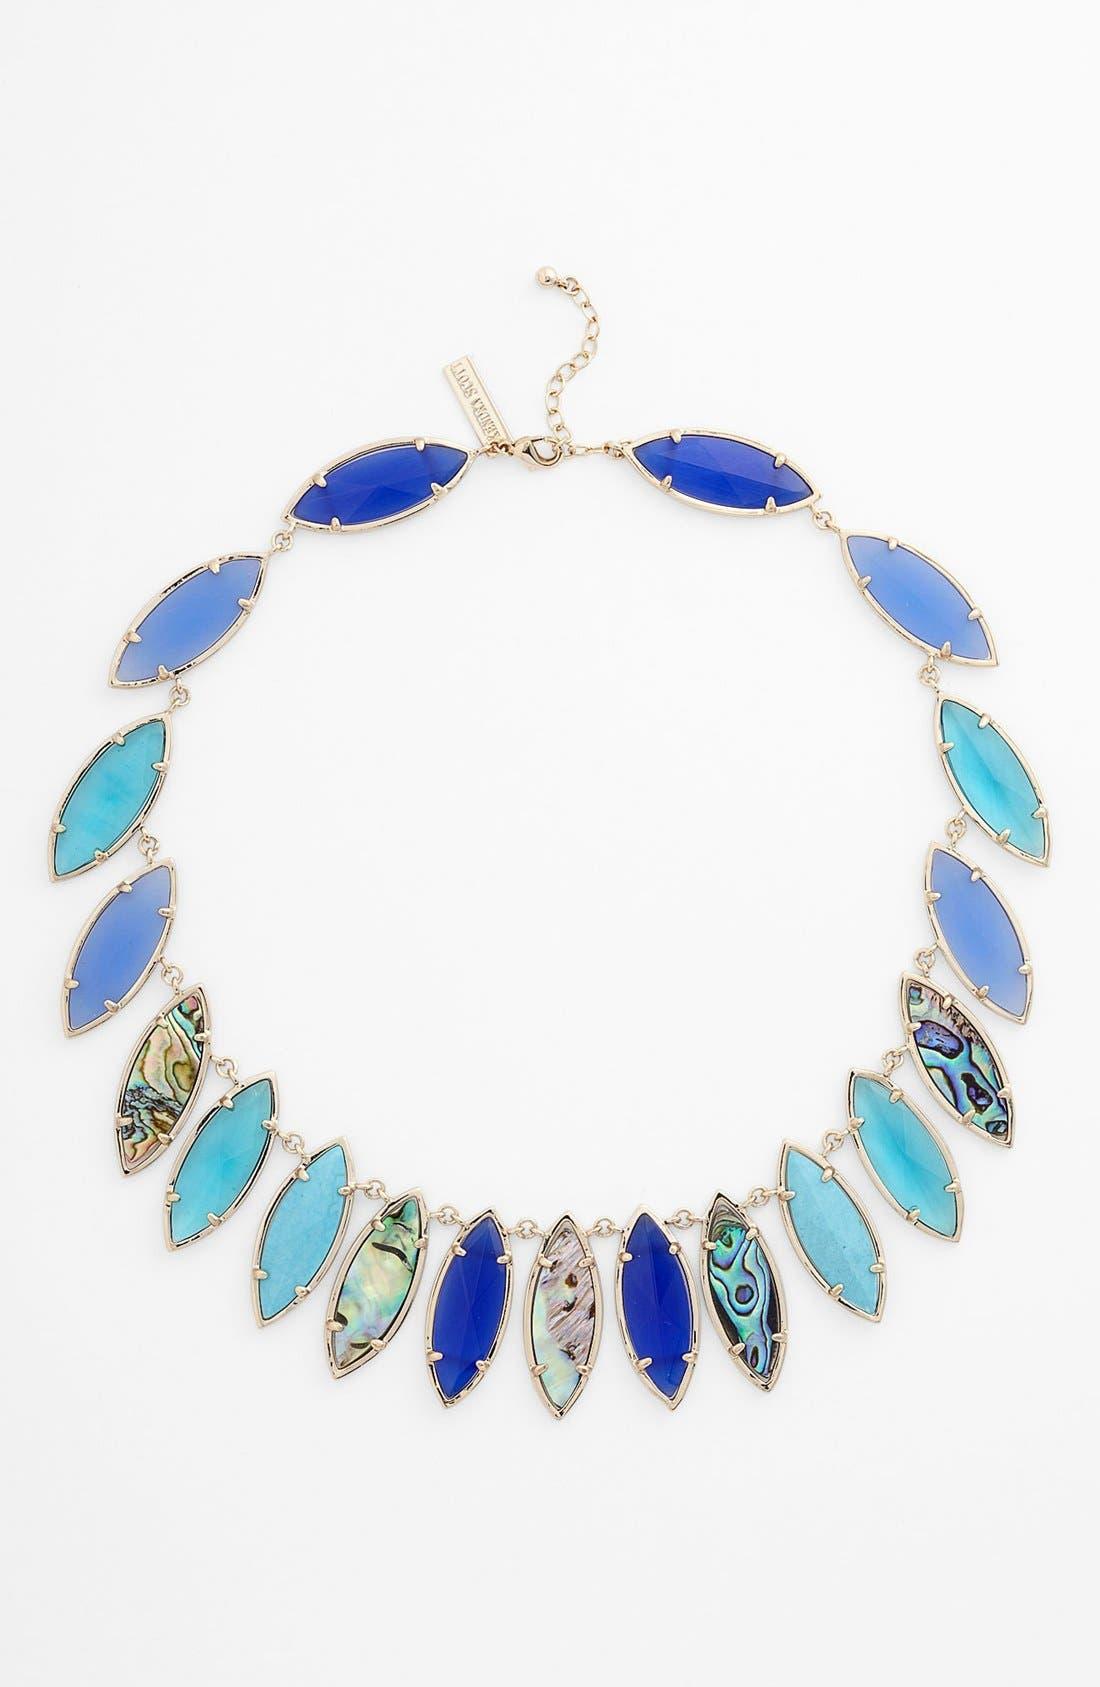 Main Image - Kendra Scott 'Island Escapade - Nalin' Collar Necklace